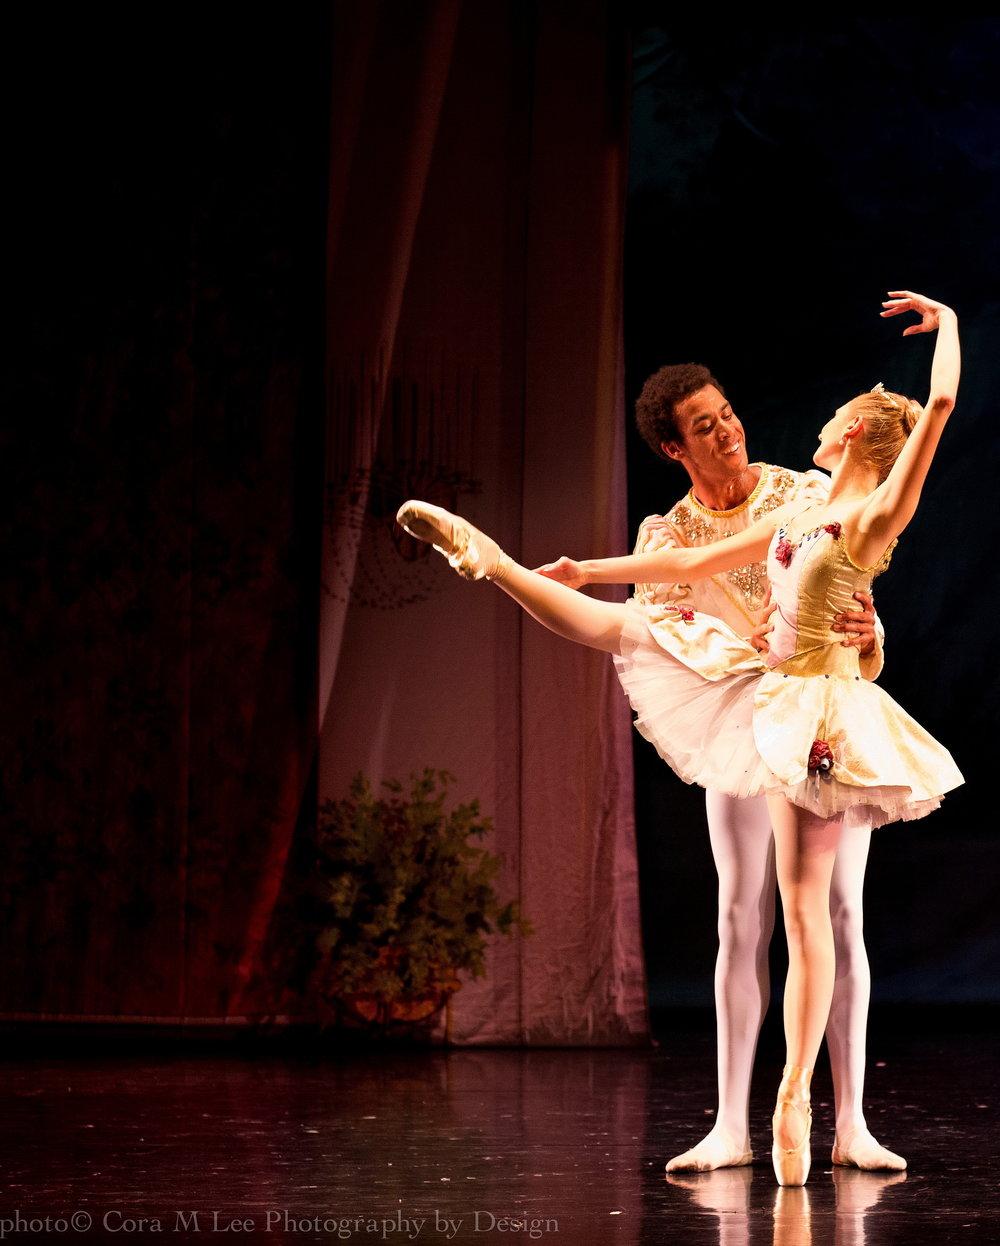 Dancers: Martin Skocelas-Hunter & Sarah Brower